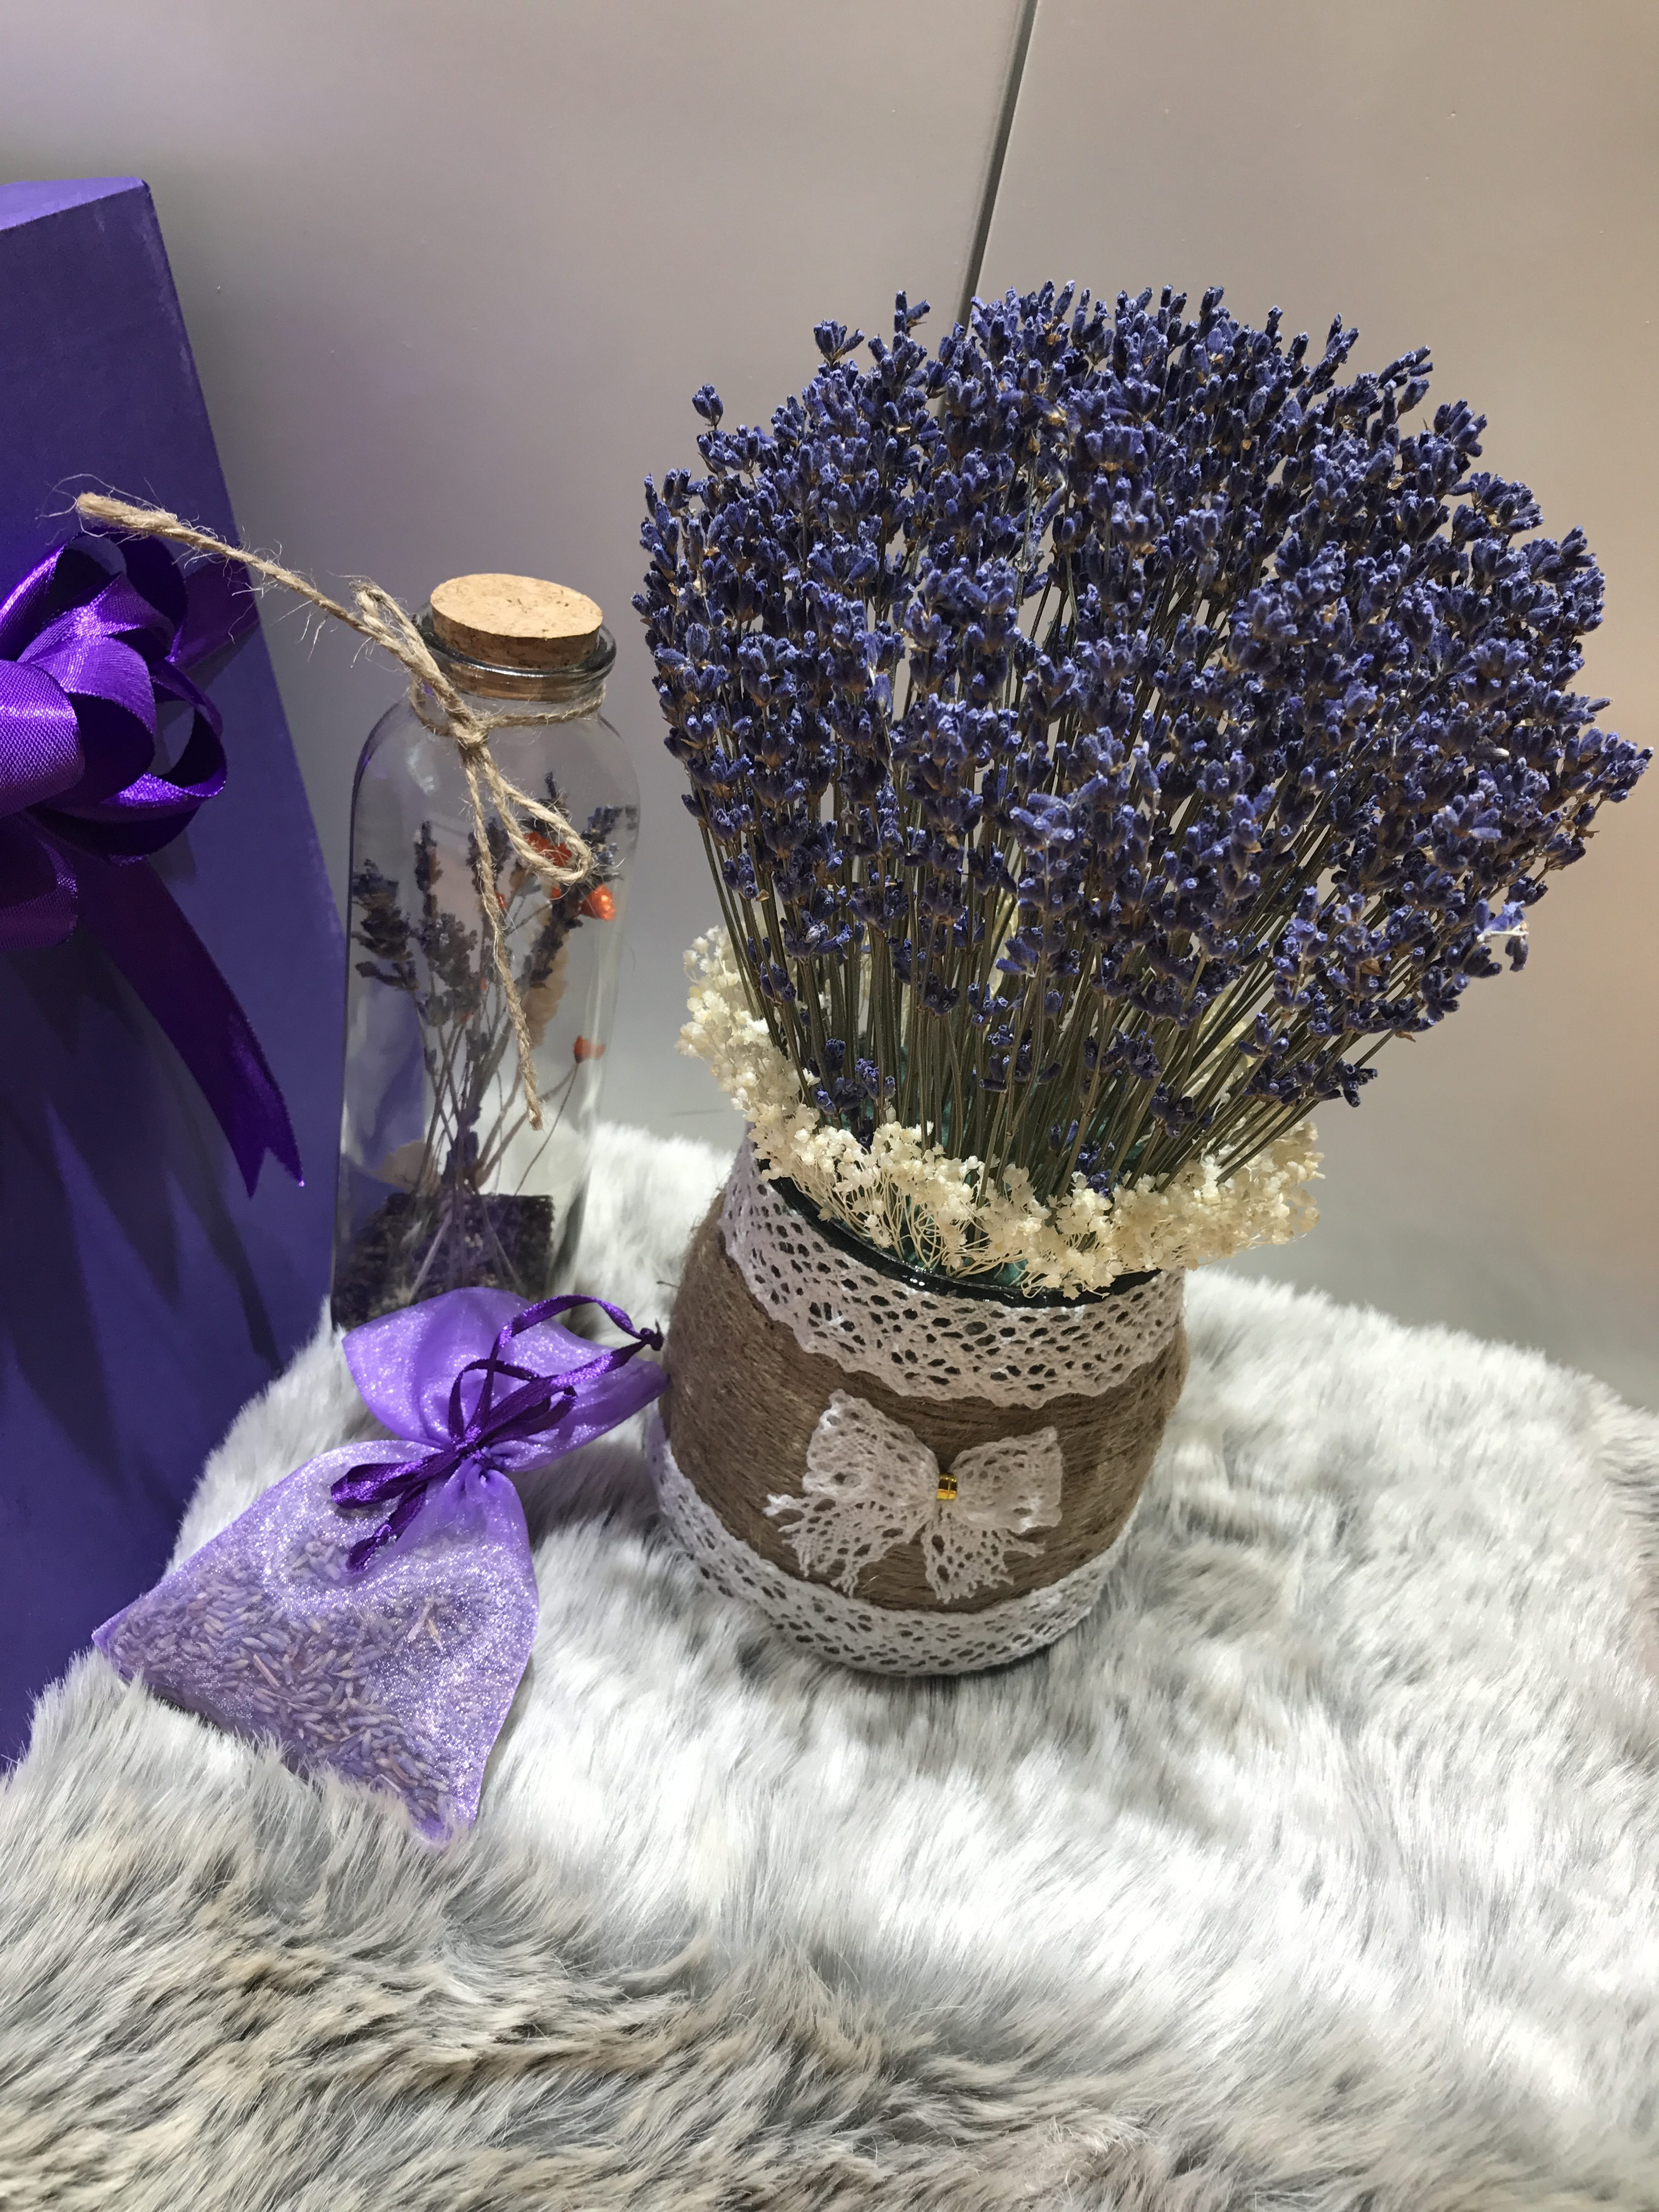 hoa lavender khô Pháp